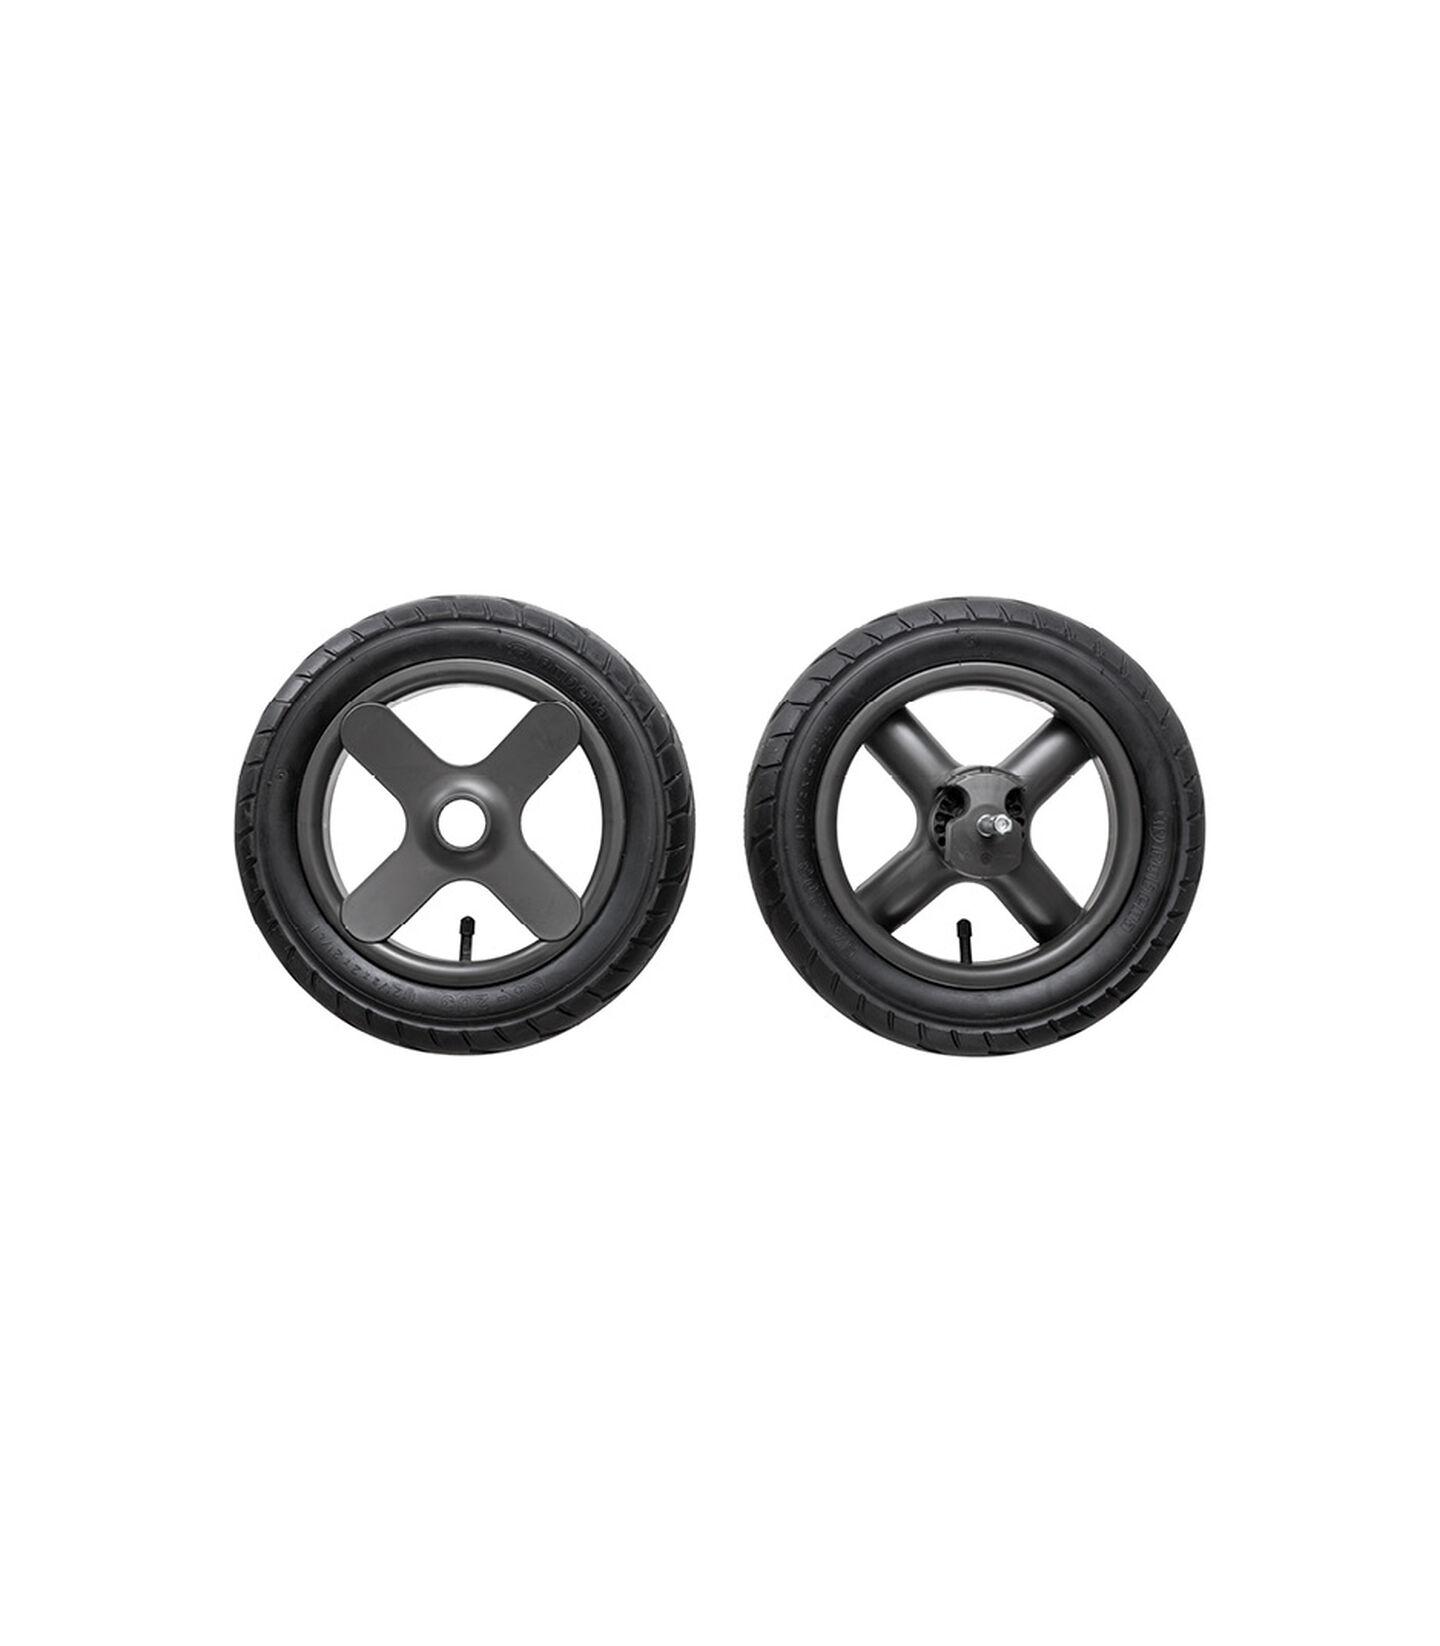 Stokke® Trailz Rear wheel complete set, , mainview view 2